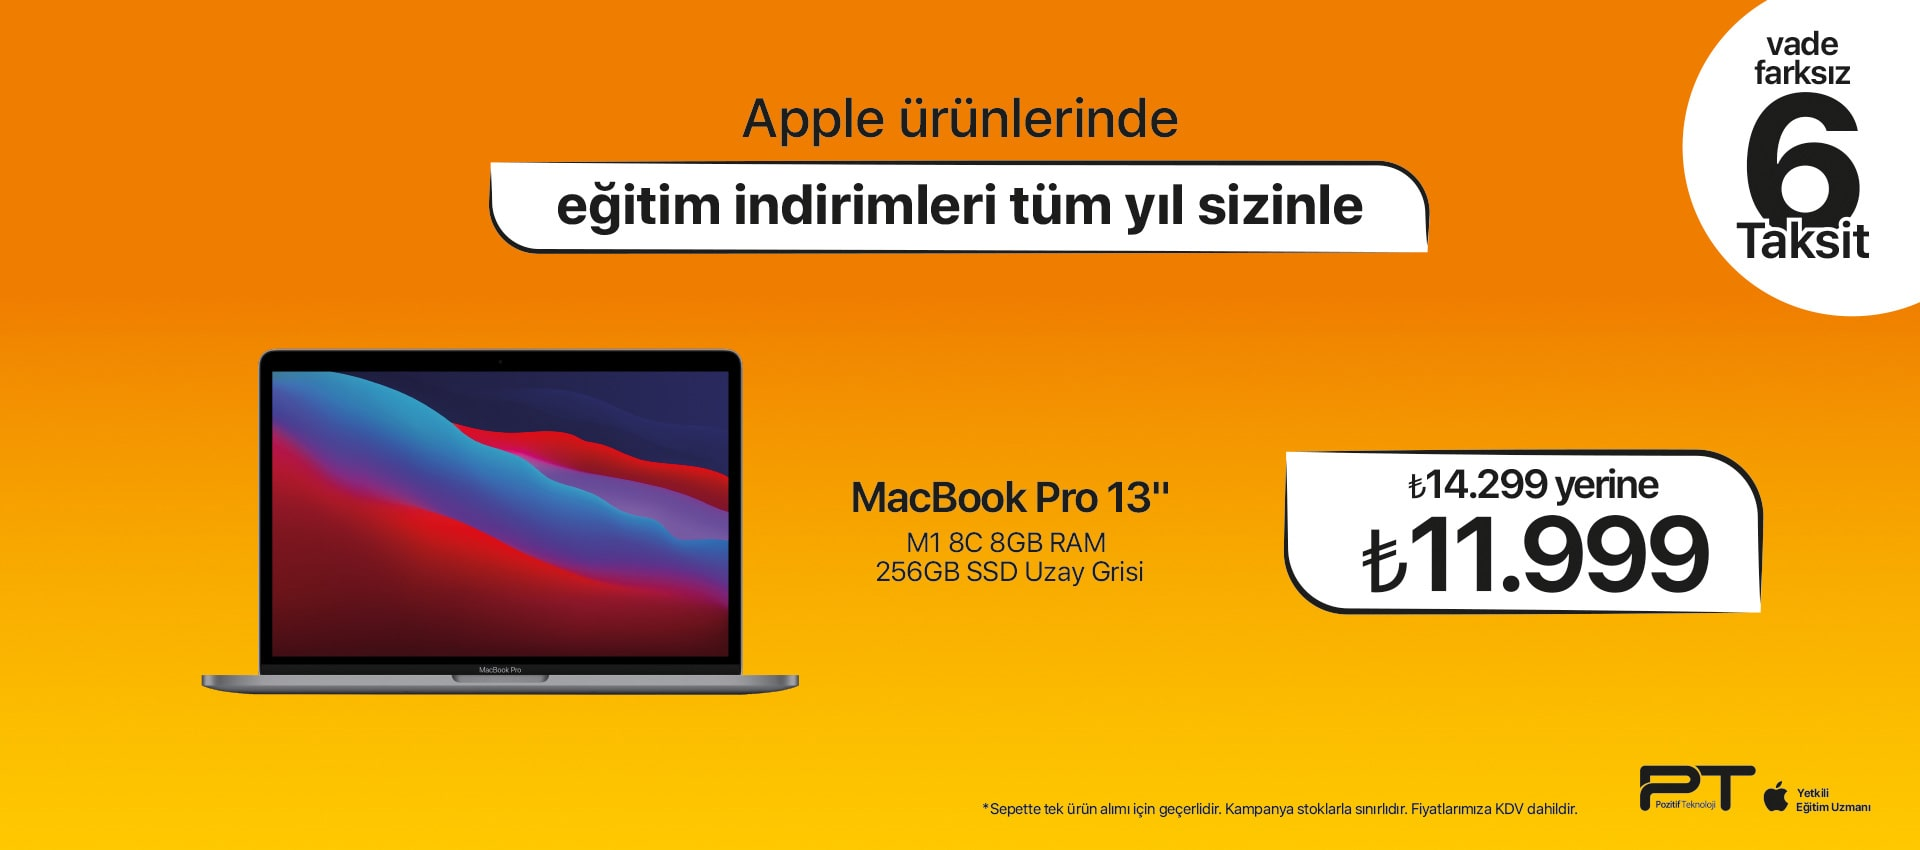 macbook  PRO 6 Taksit NEW